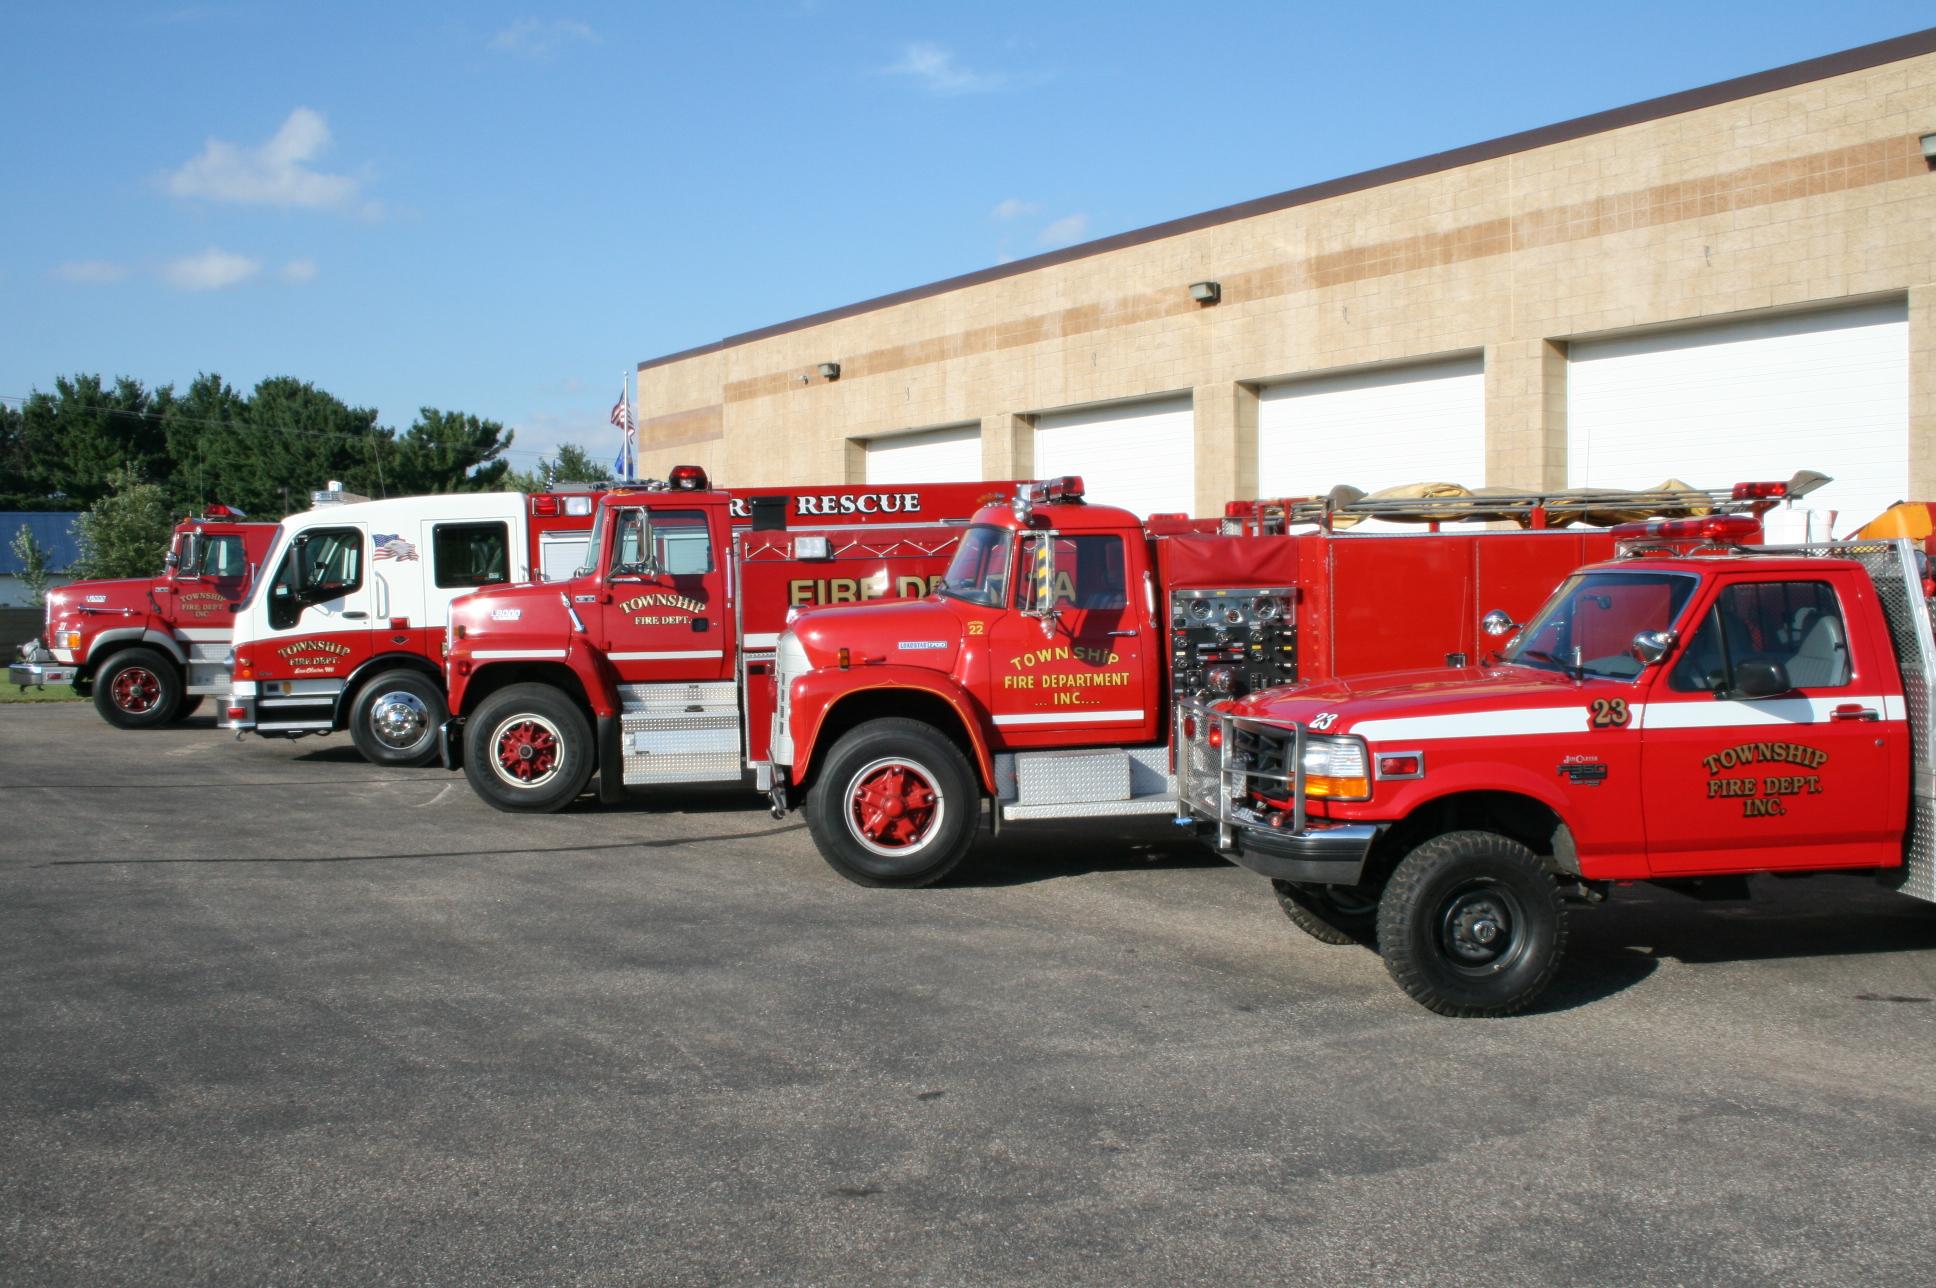 Washington Township truck lineup side